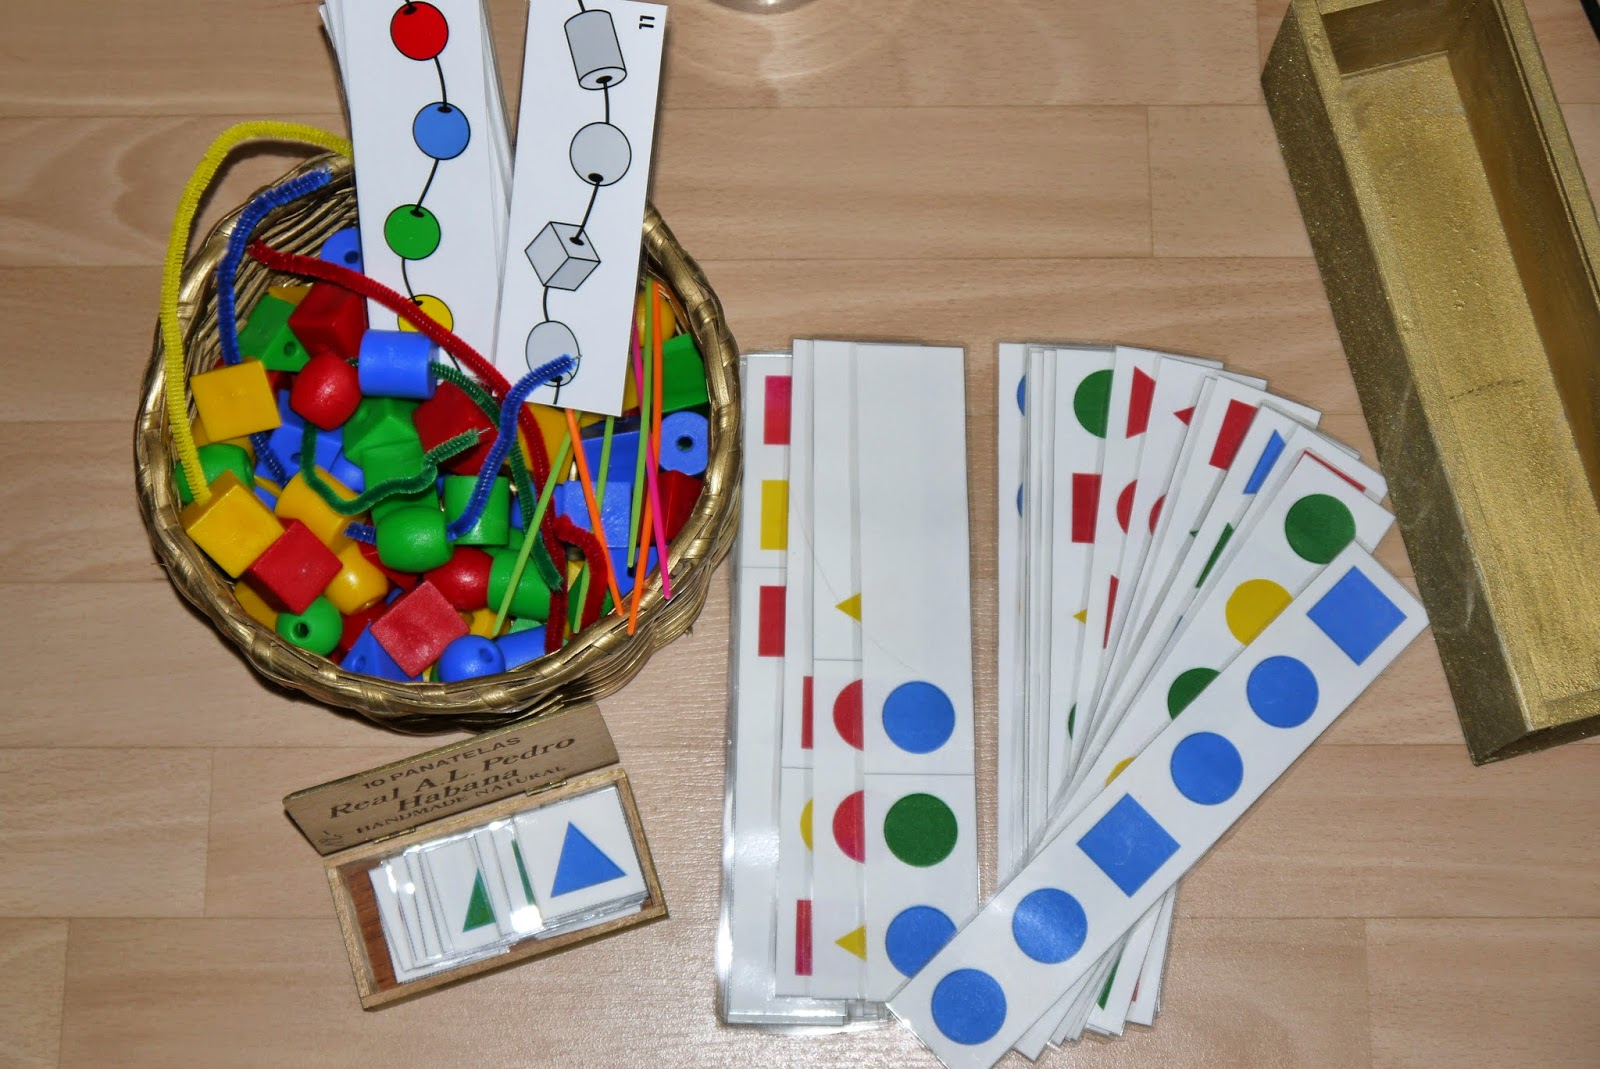 jeux d 39 enfants activit enfant algorithme avec des. Black Bedroom Furniture Sets. Home Design Ideas